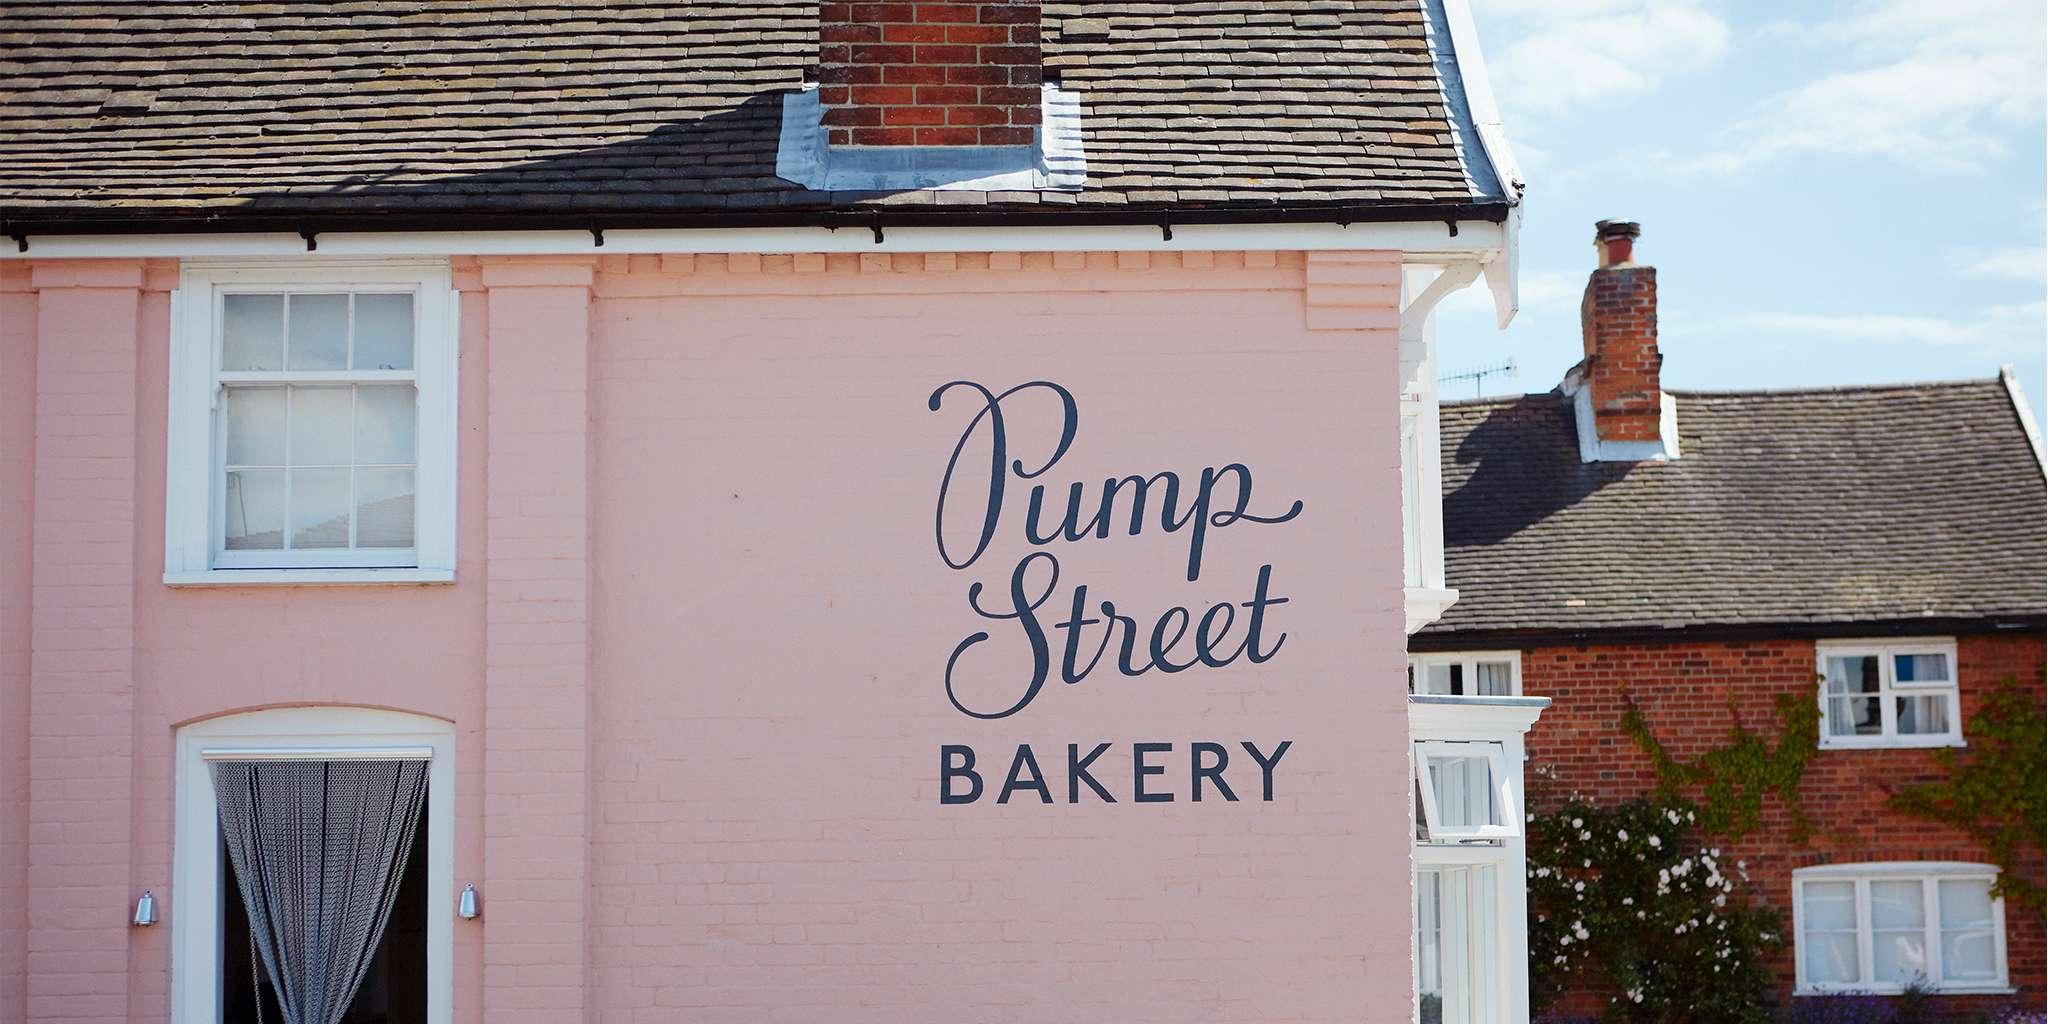 Pump Street Bakery